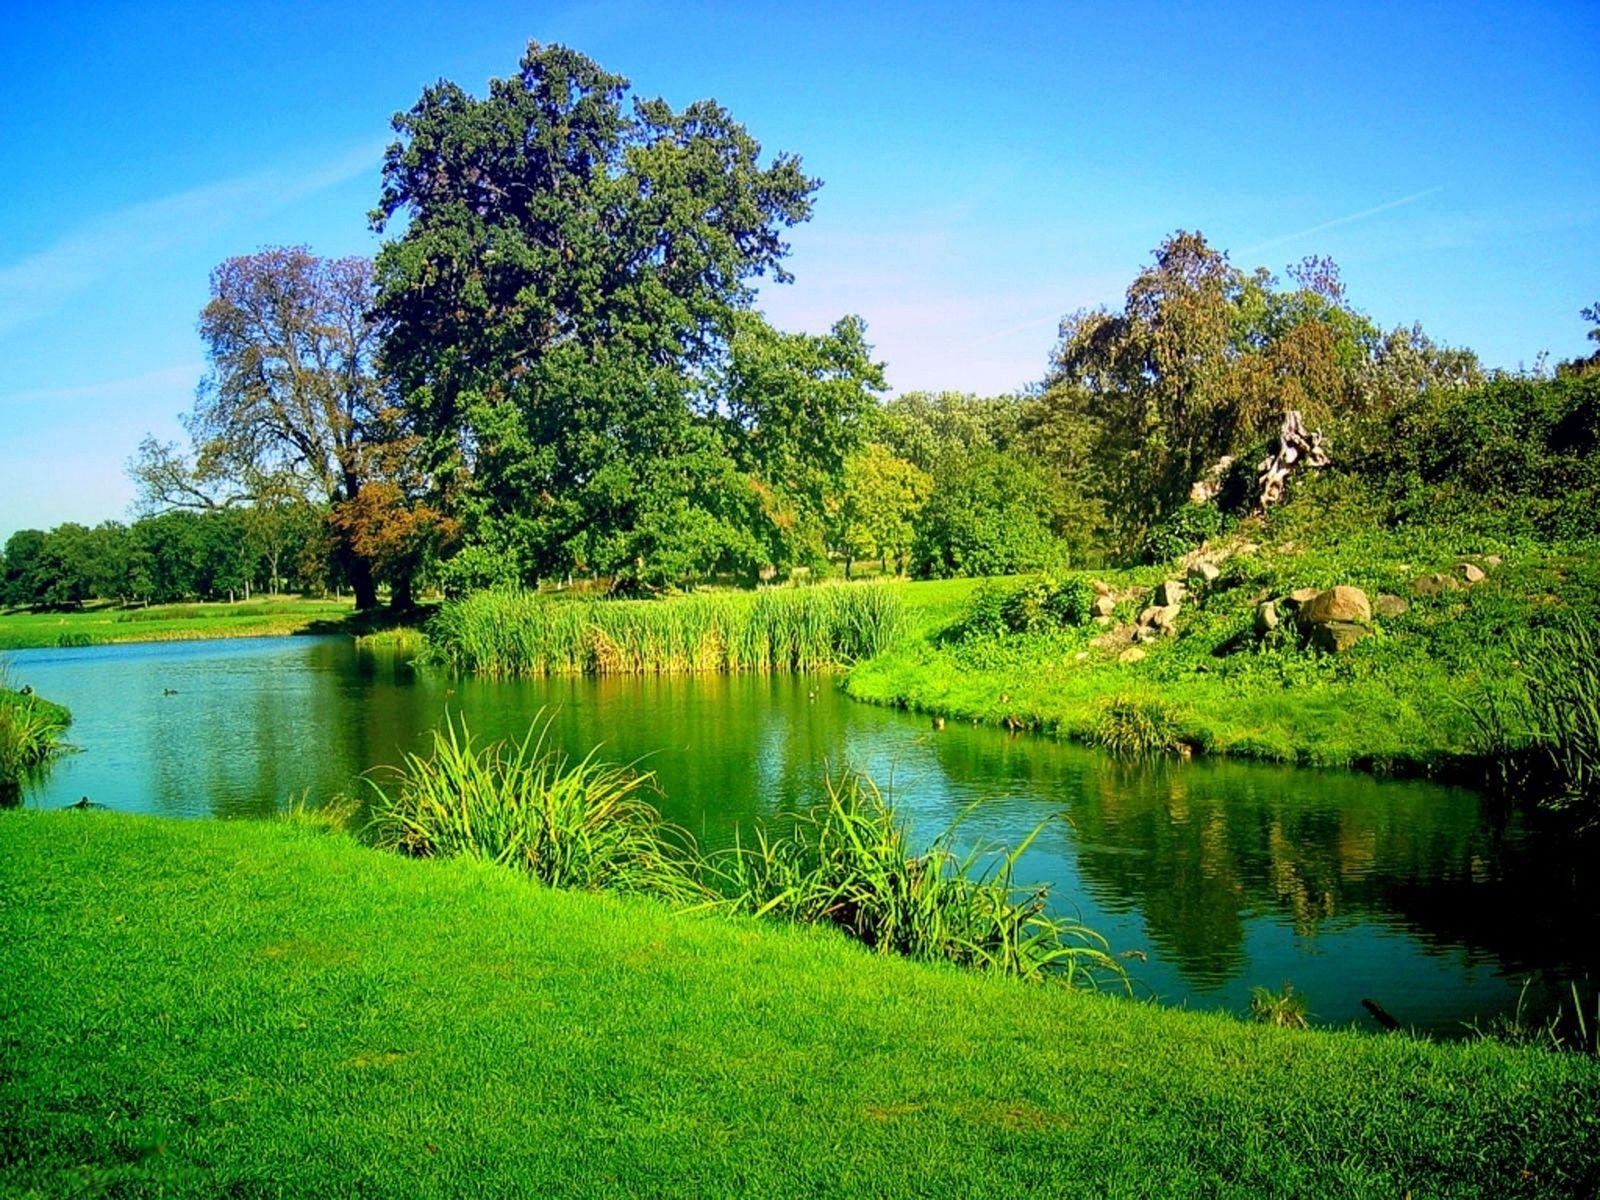 صور غابات جميلة 5